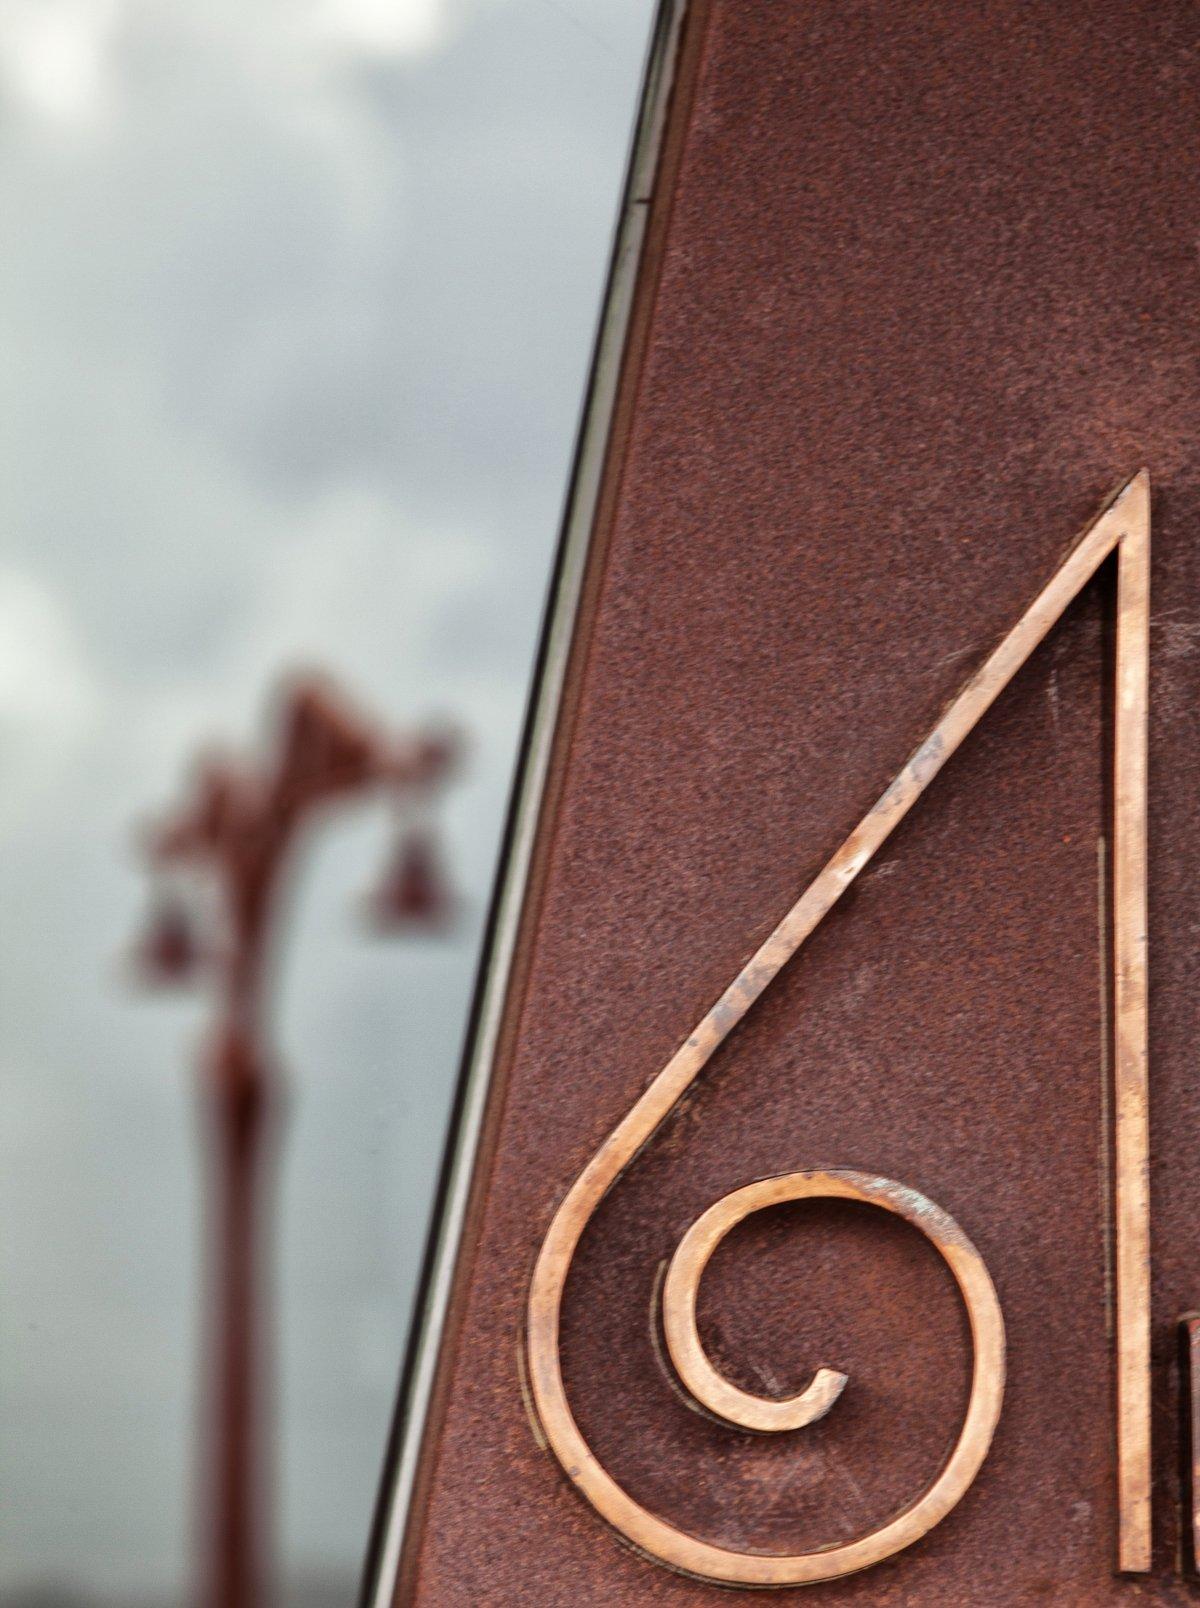 Emblema del restaurante Alborada